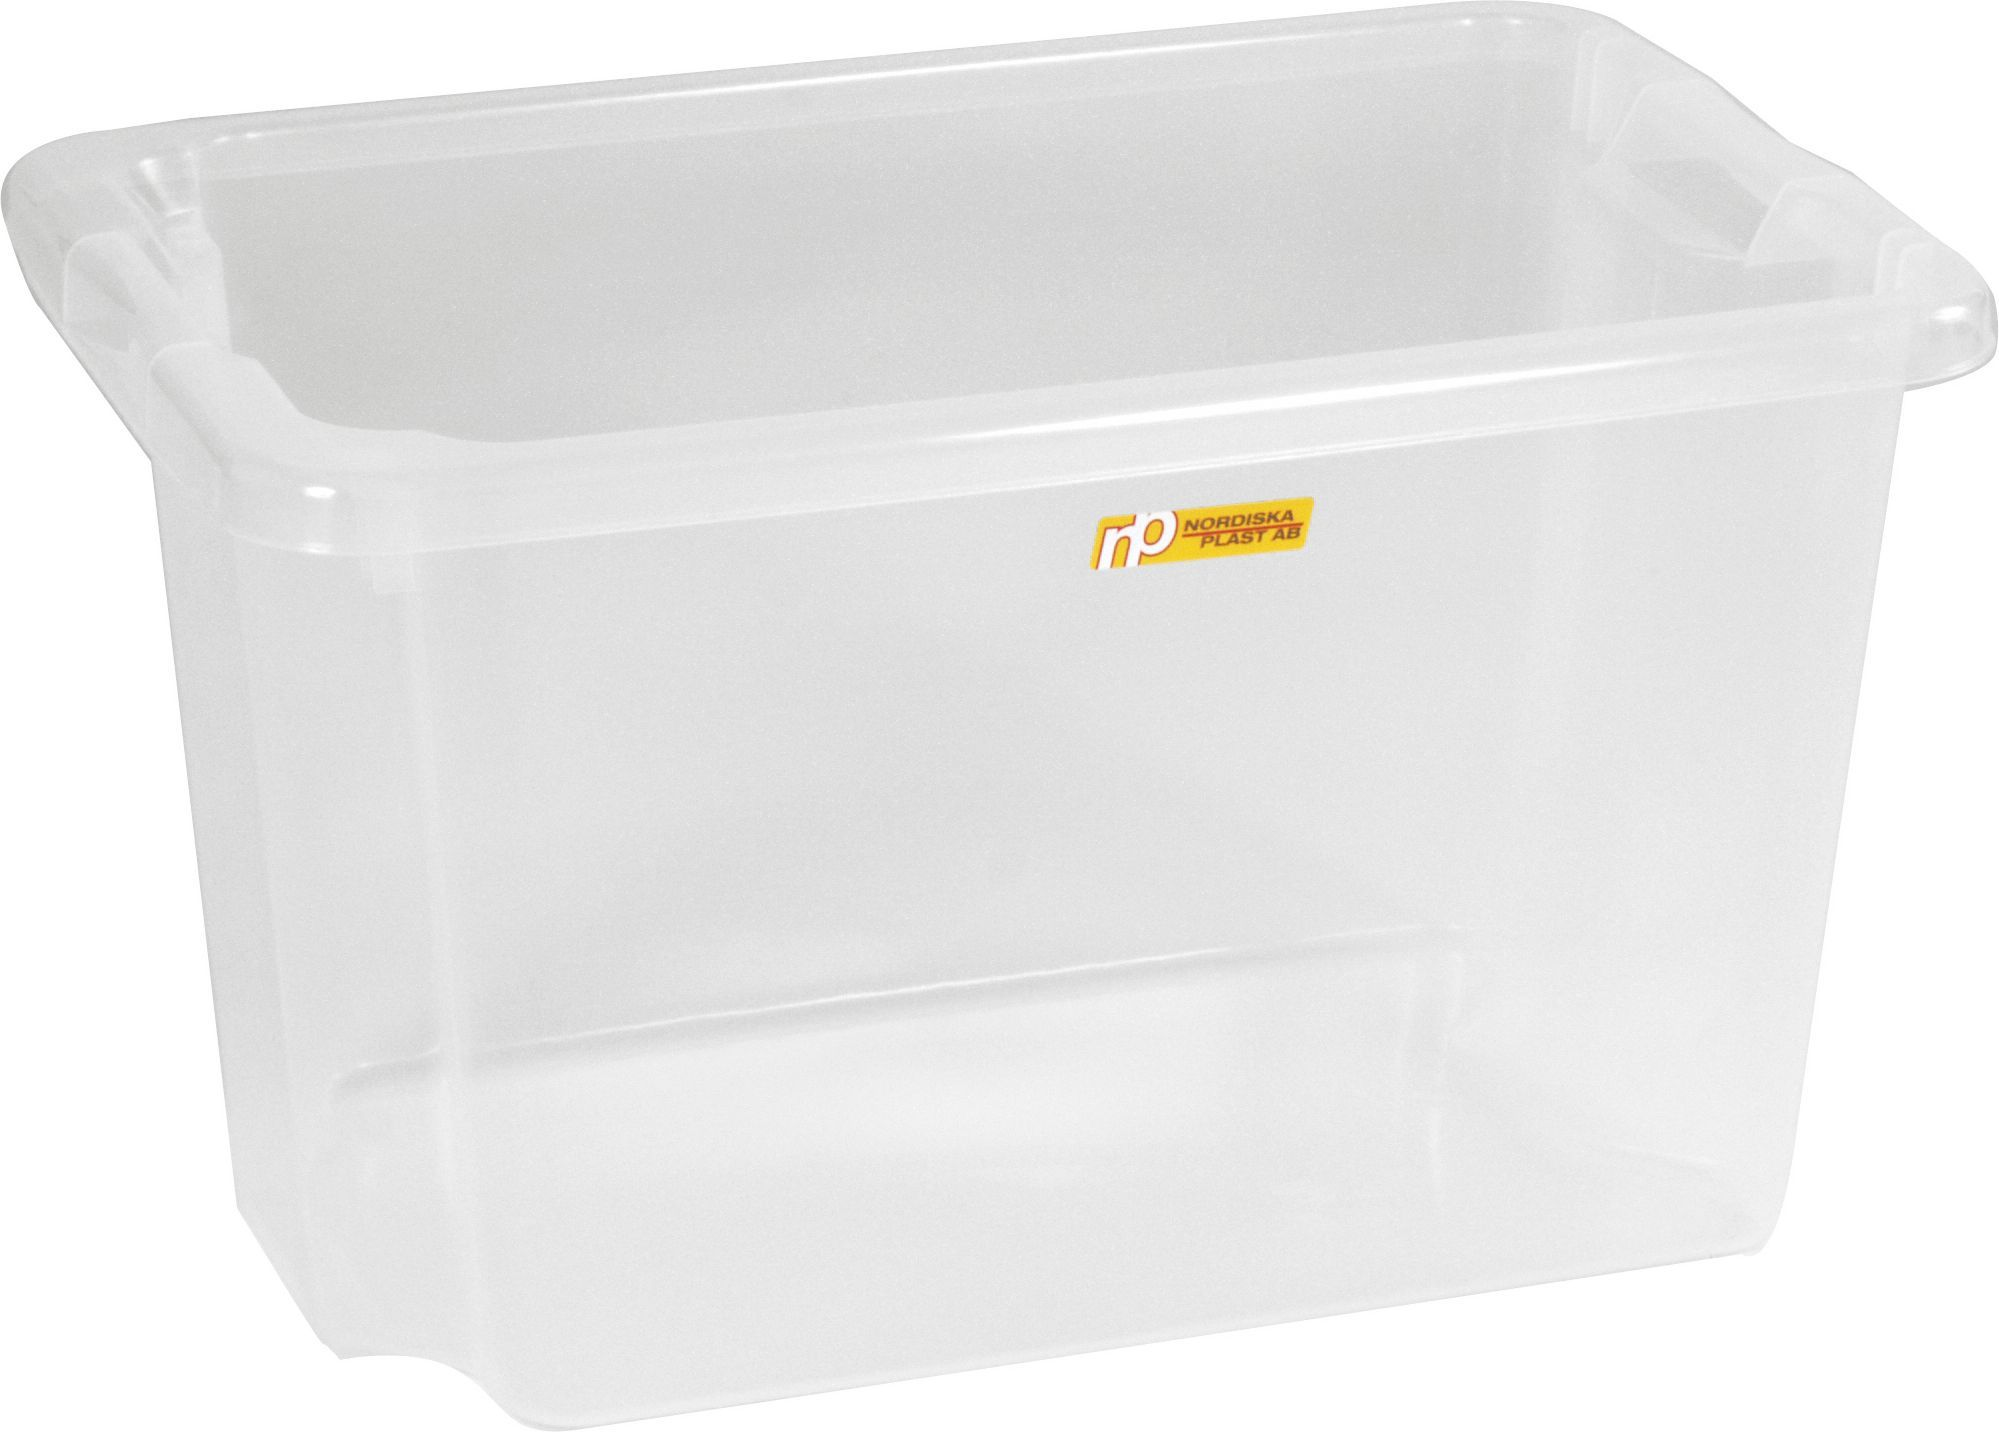 Oppbevaringsboks 33L transparent plast 74000500